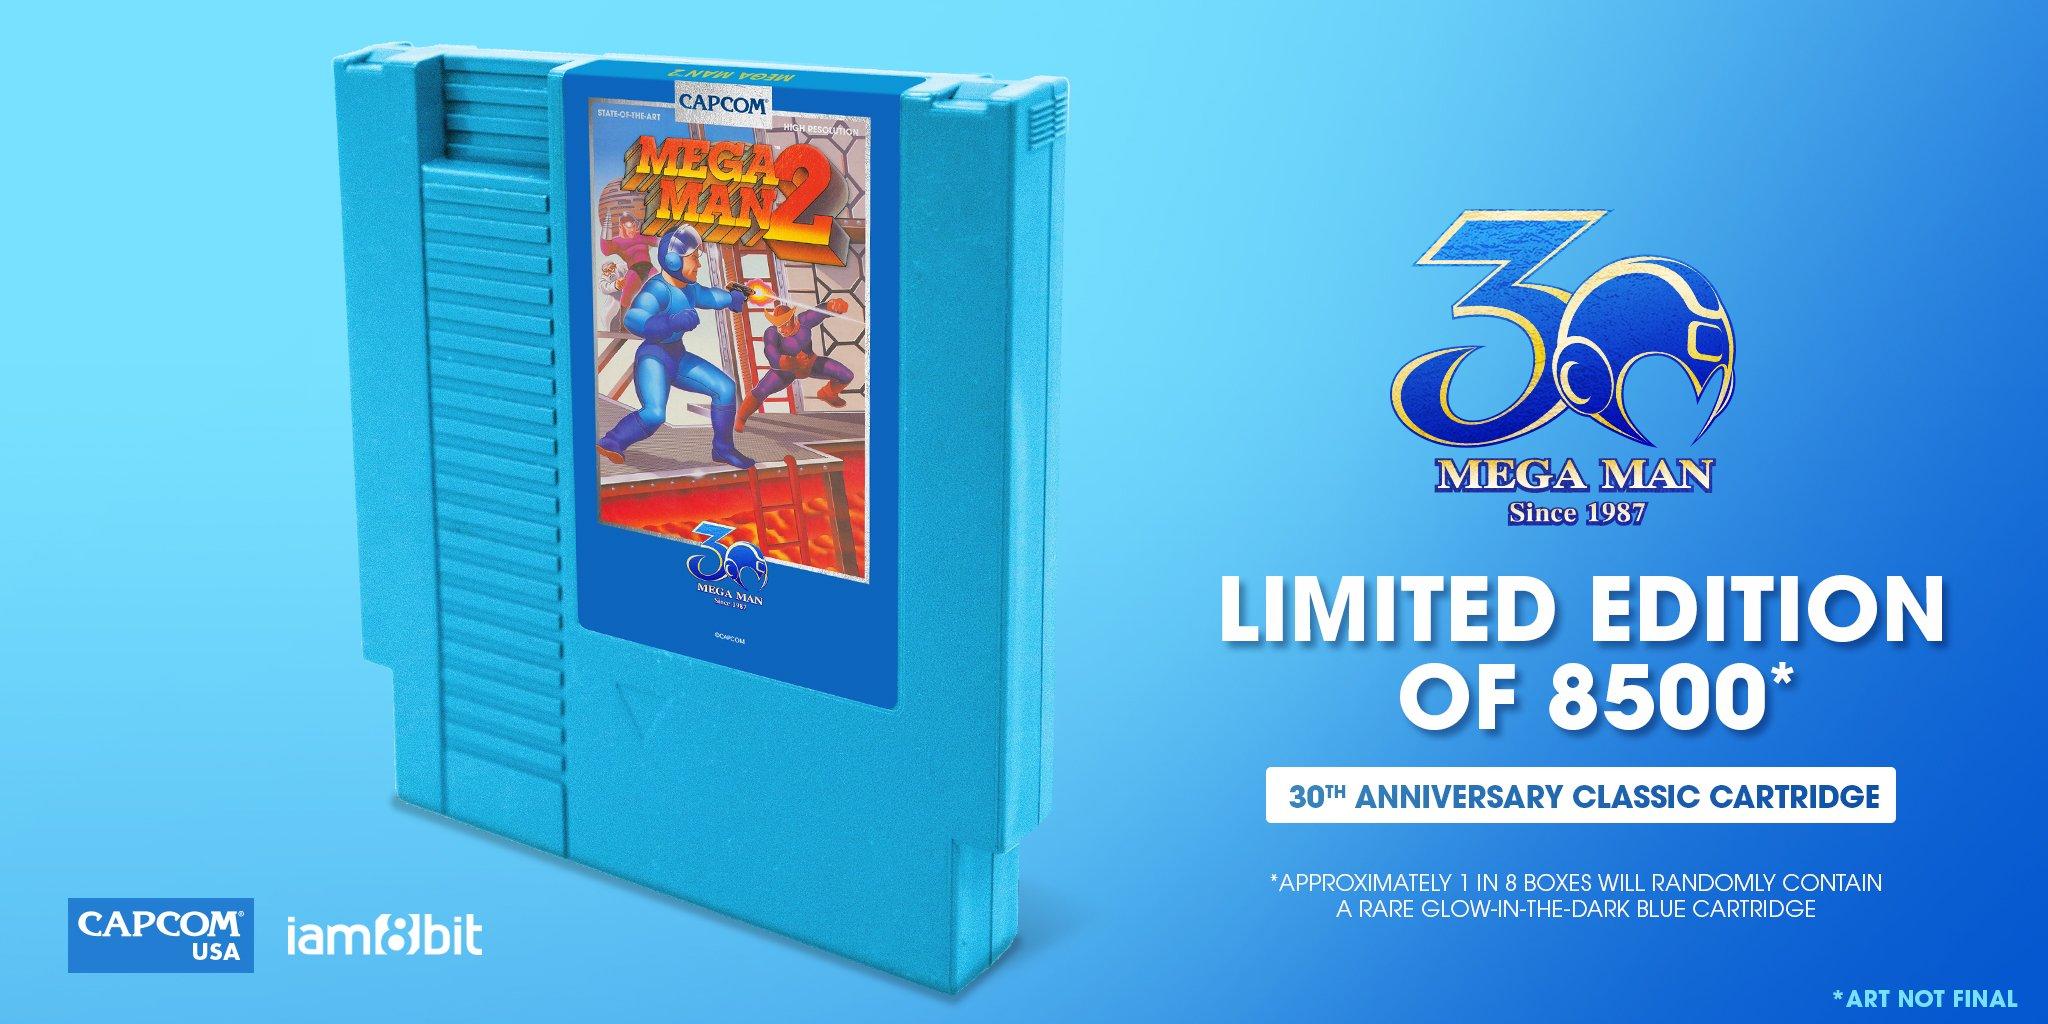 02-Mega_Man_2-30th_Anniversary_Classic_Cartridge.JPG